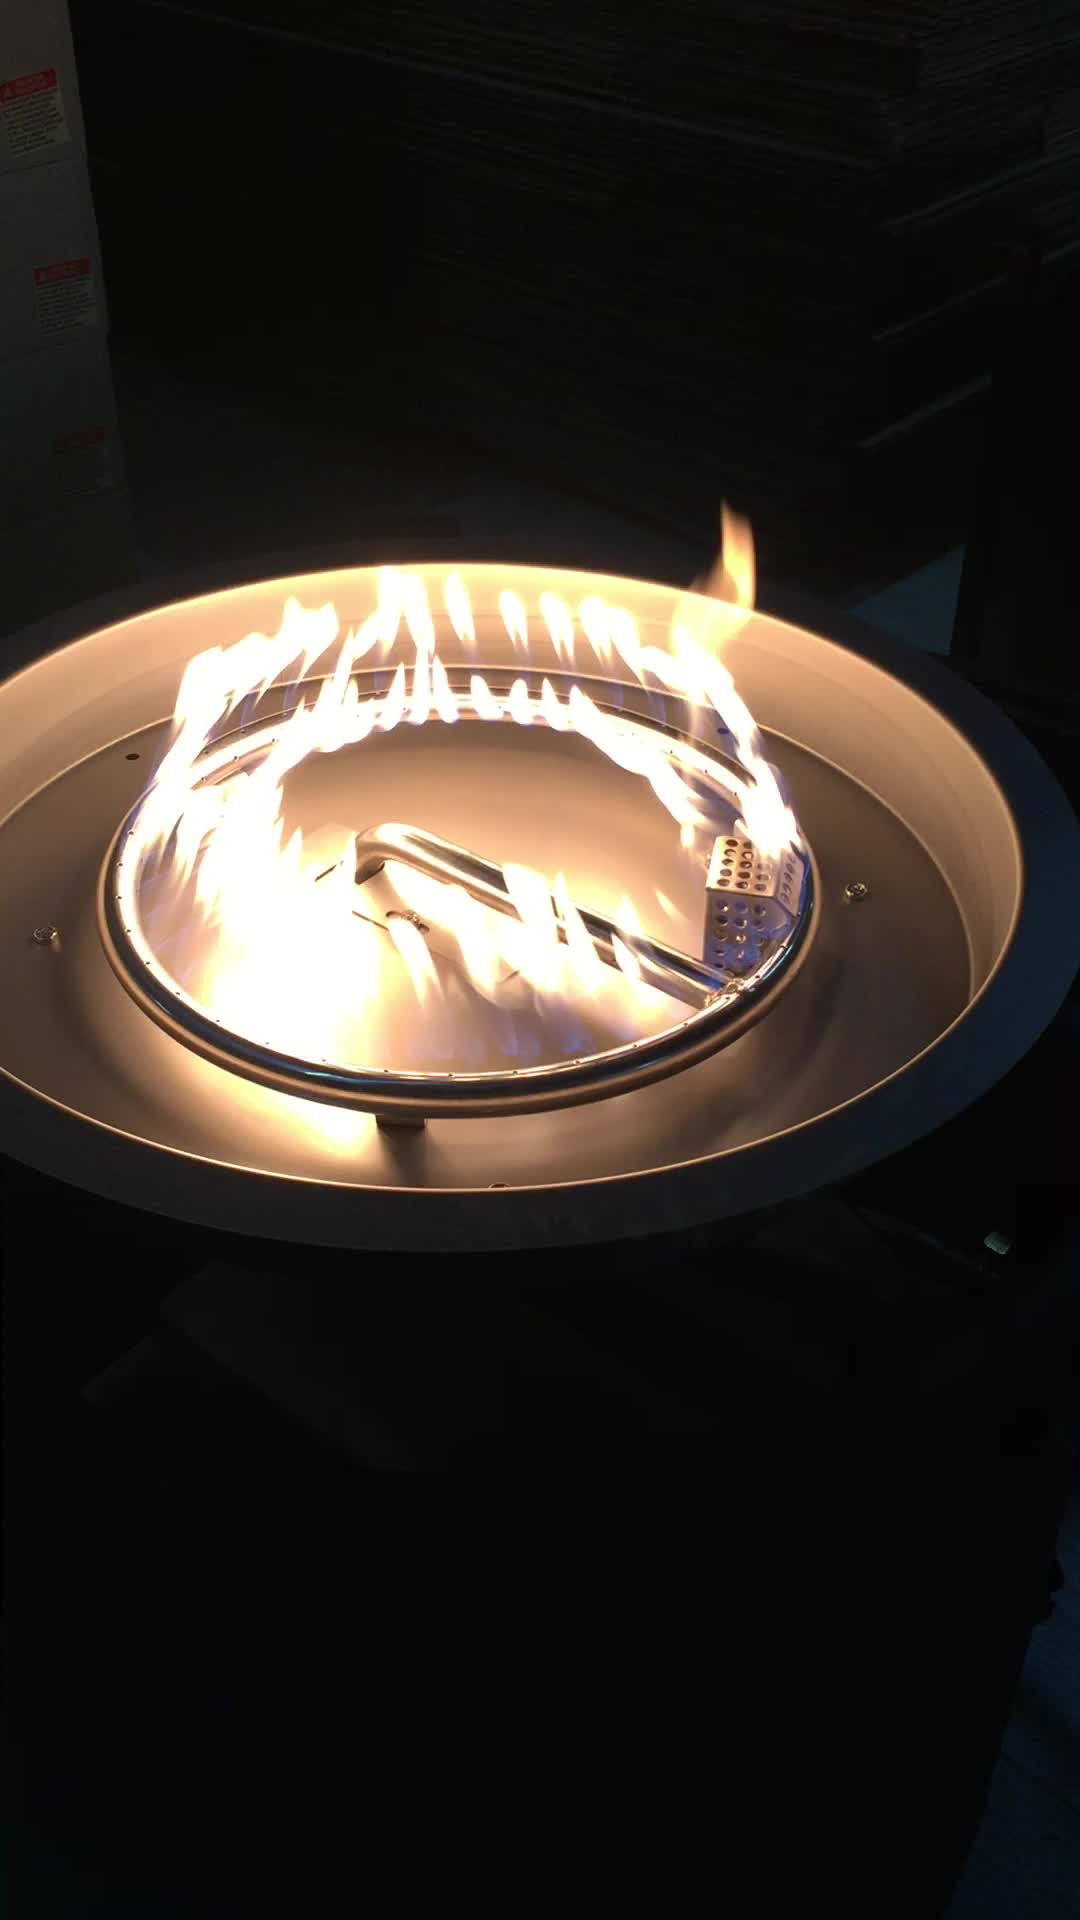 55,000 BTU 42in दौर ग्रेनाइट शीर्ष प्रोपेन गैस आग गड्ढे टेबल, सीएसए प्रमाण पत्र